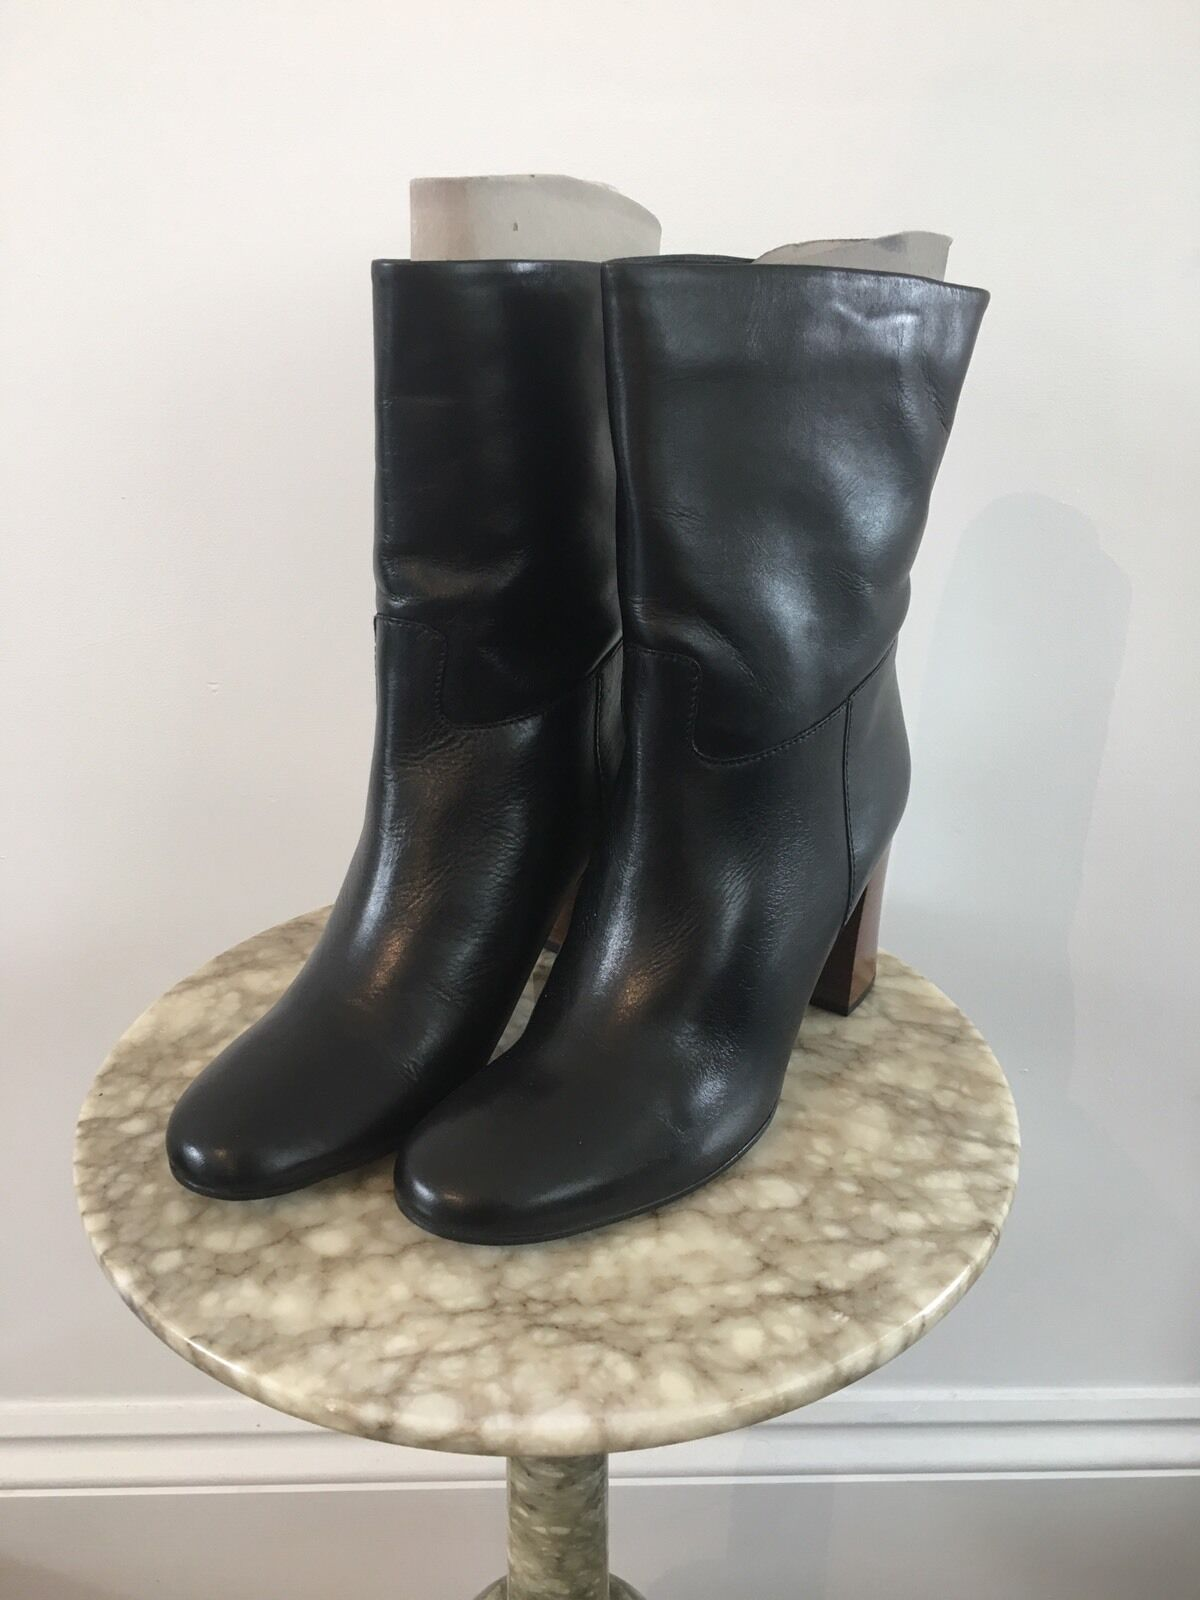 New Kin By John Lewis Roel Womens Black Leather Block Heel Boots Uk 6 Eu 39